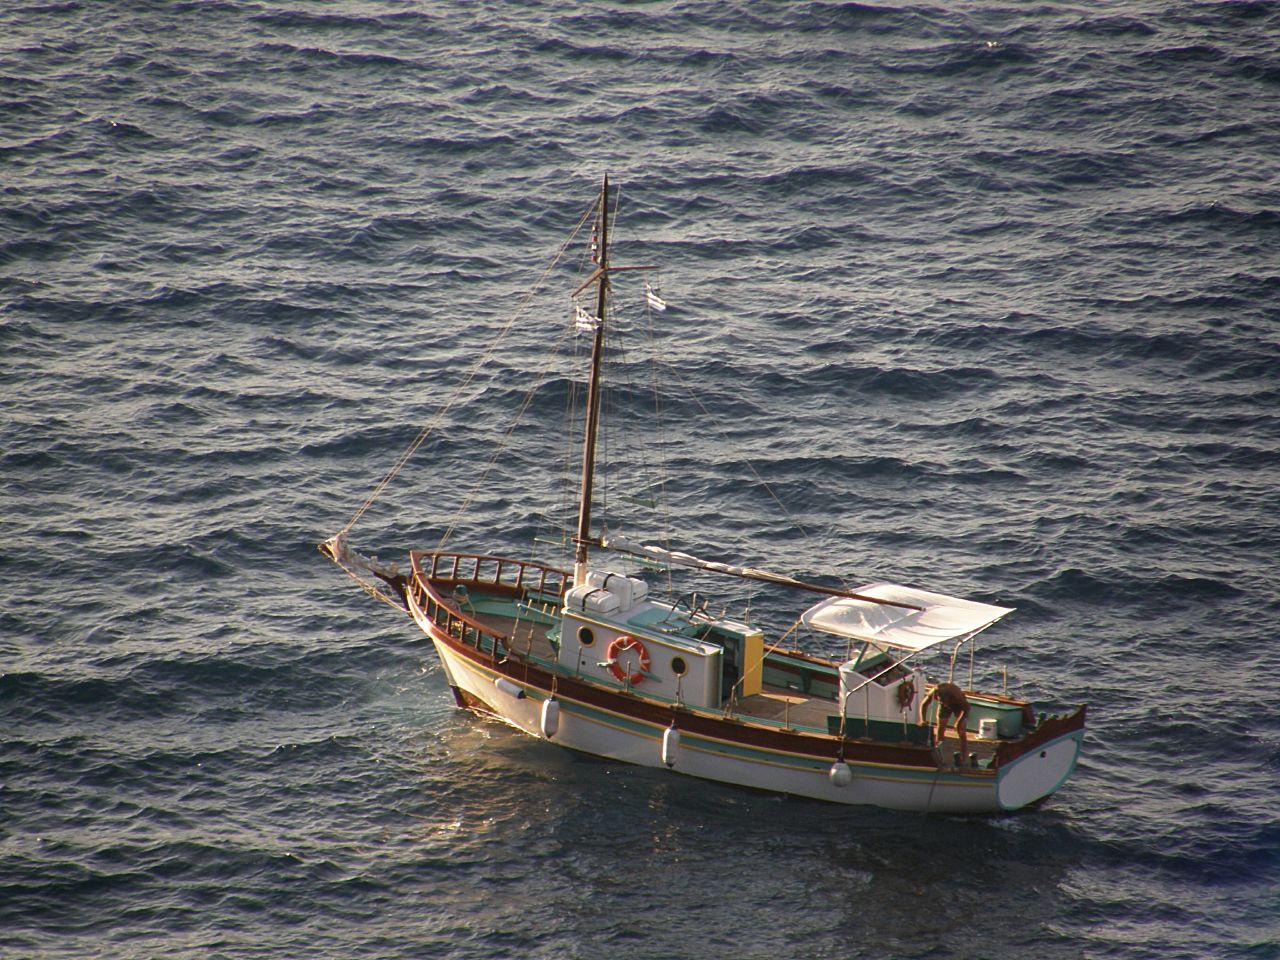 Fenders on sailboat